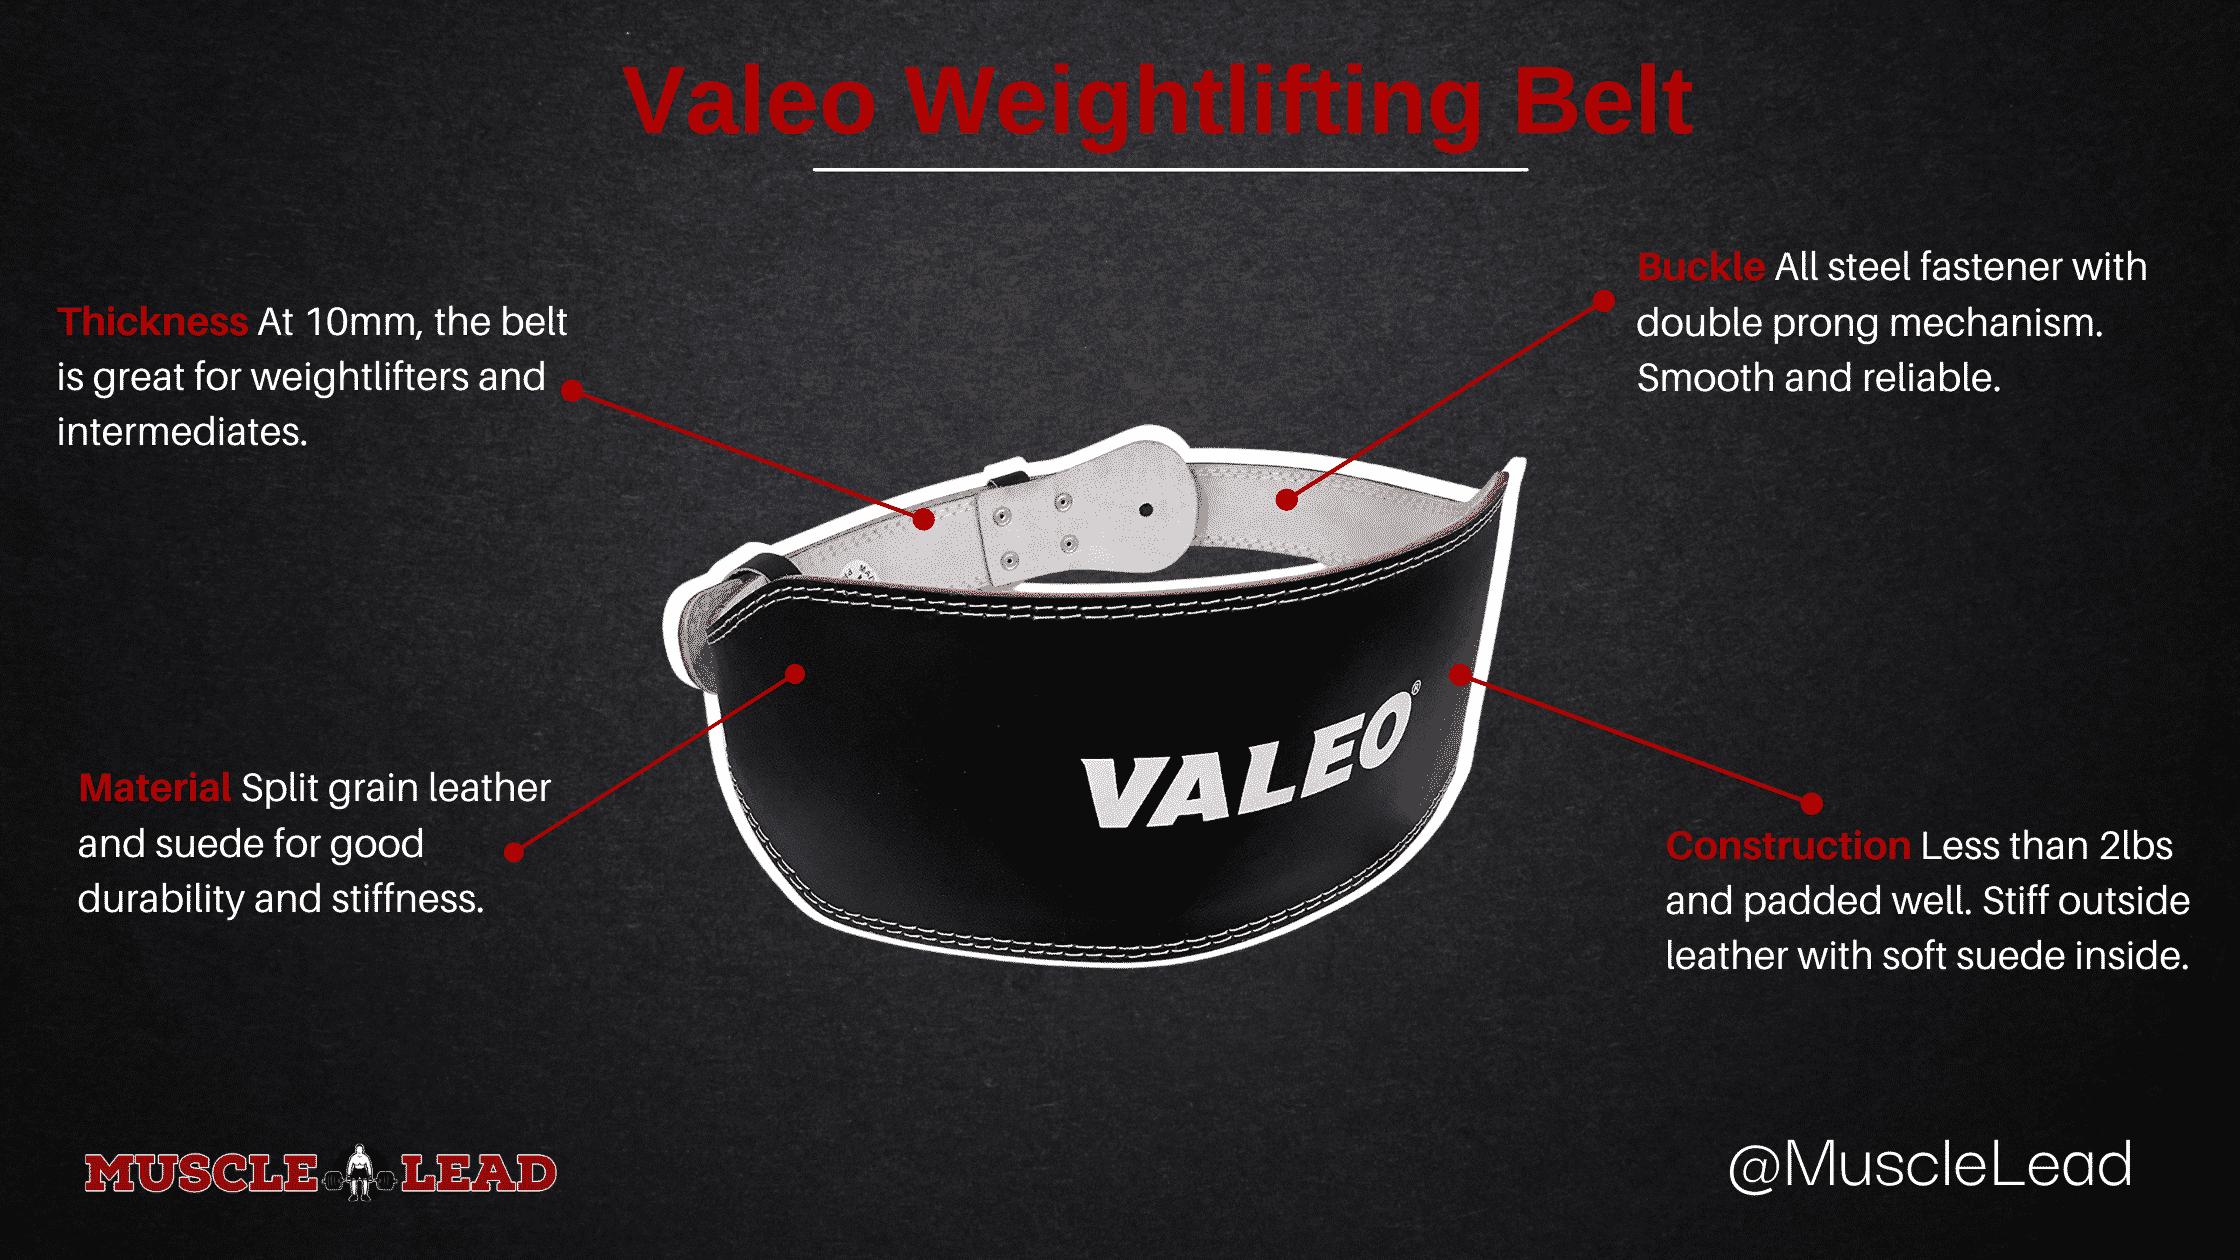 valeo weightlifting belt overview